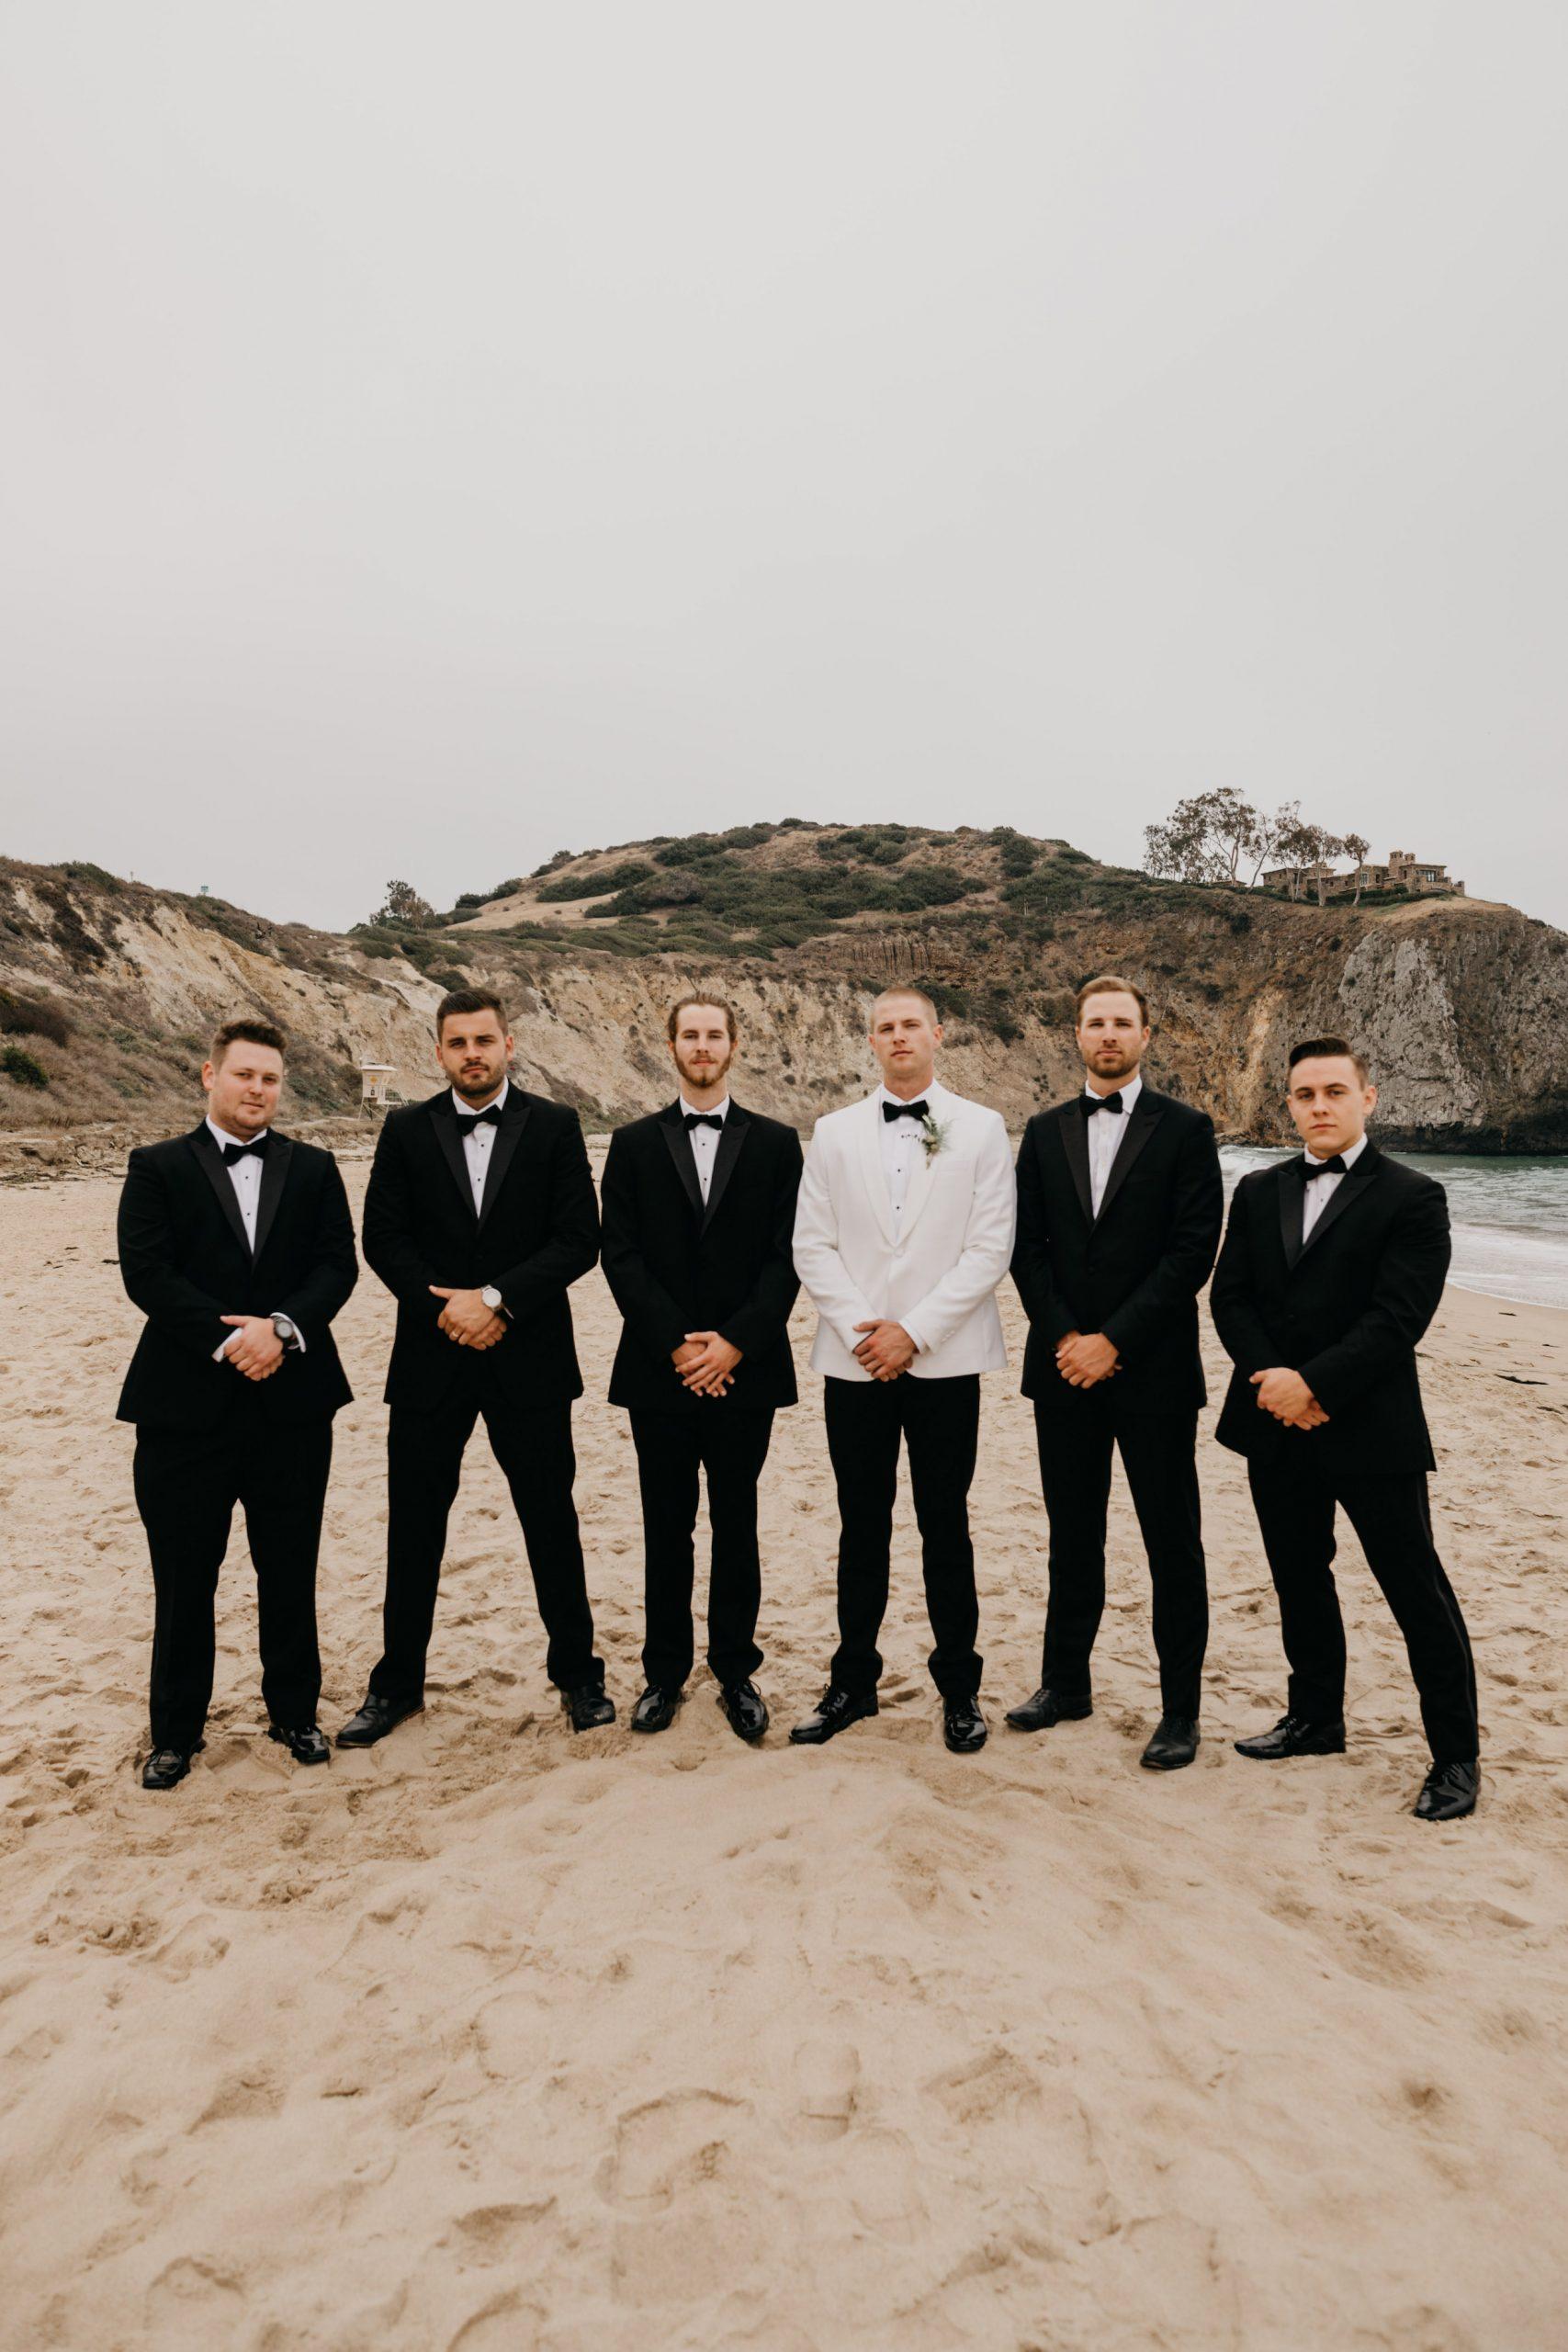 Groom and groomsmen in Crystal Cove State Park Wedding in Laguna beach, image by Fatima Elreda Photo